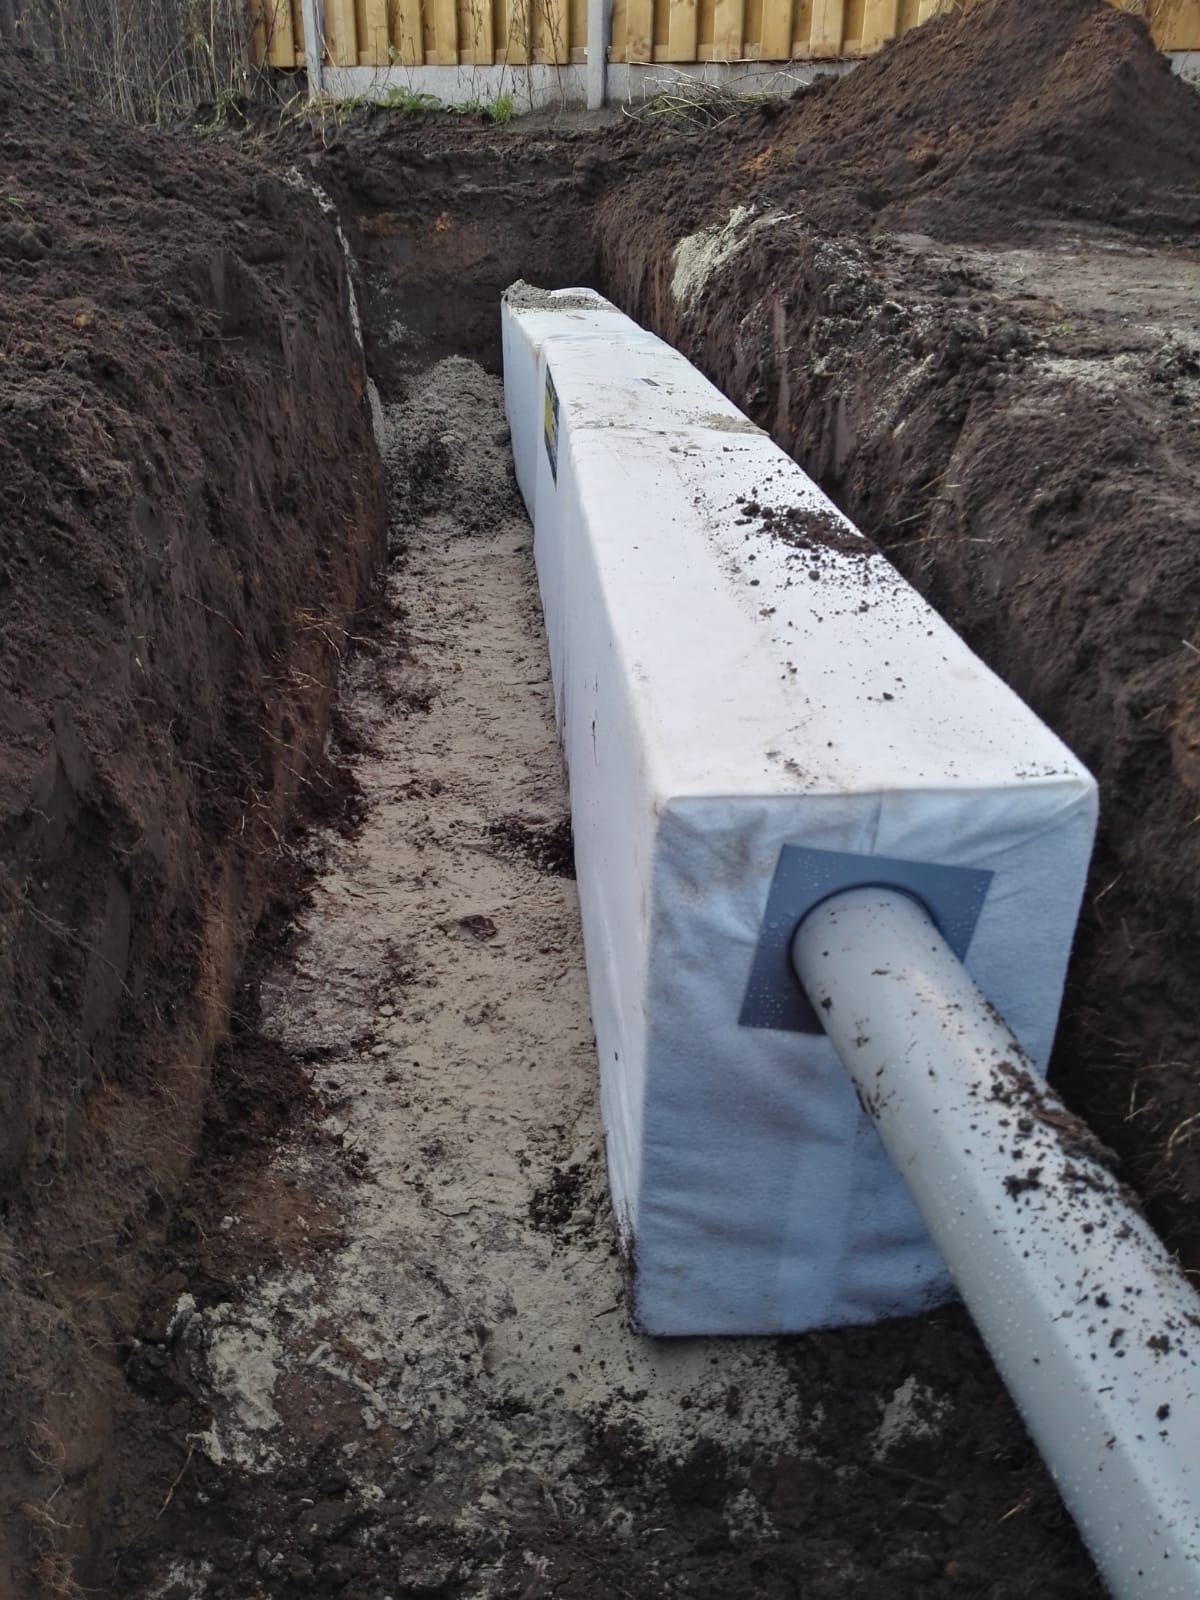 Project Hydroblob Rioolherstel Assen